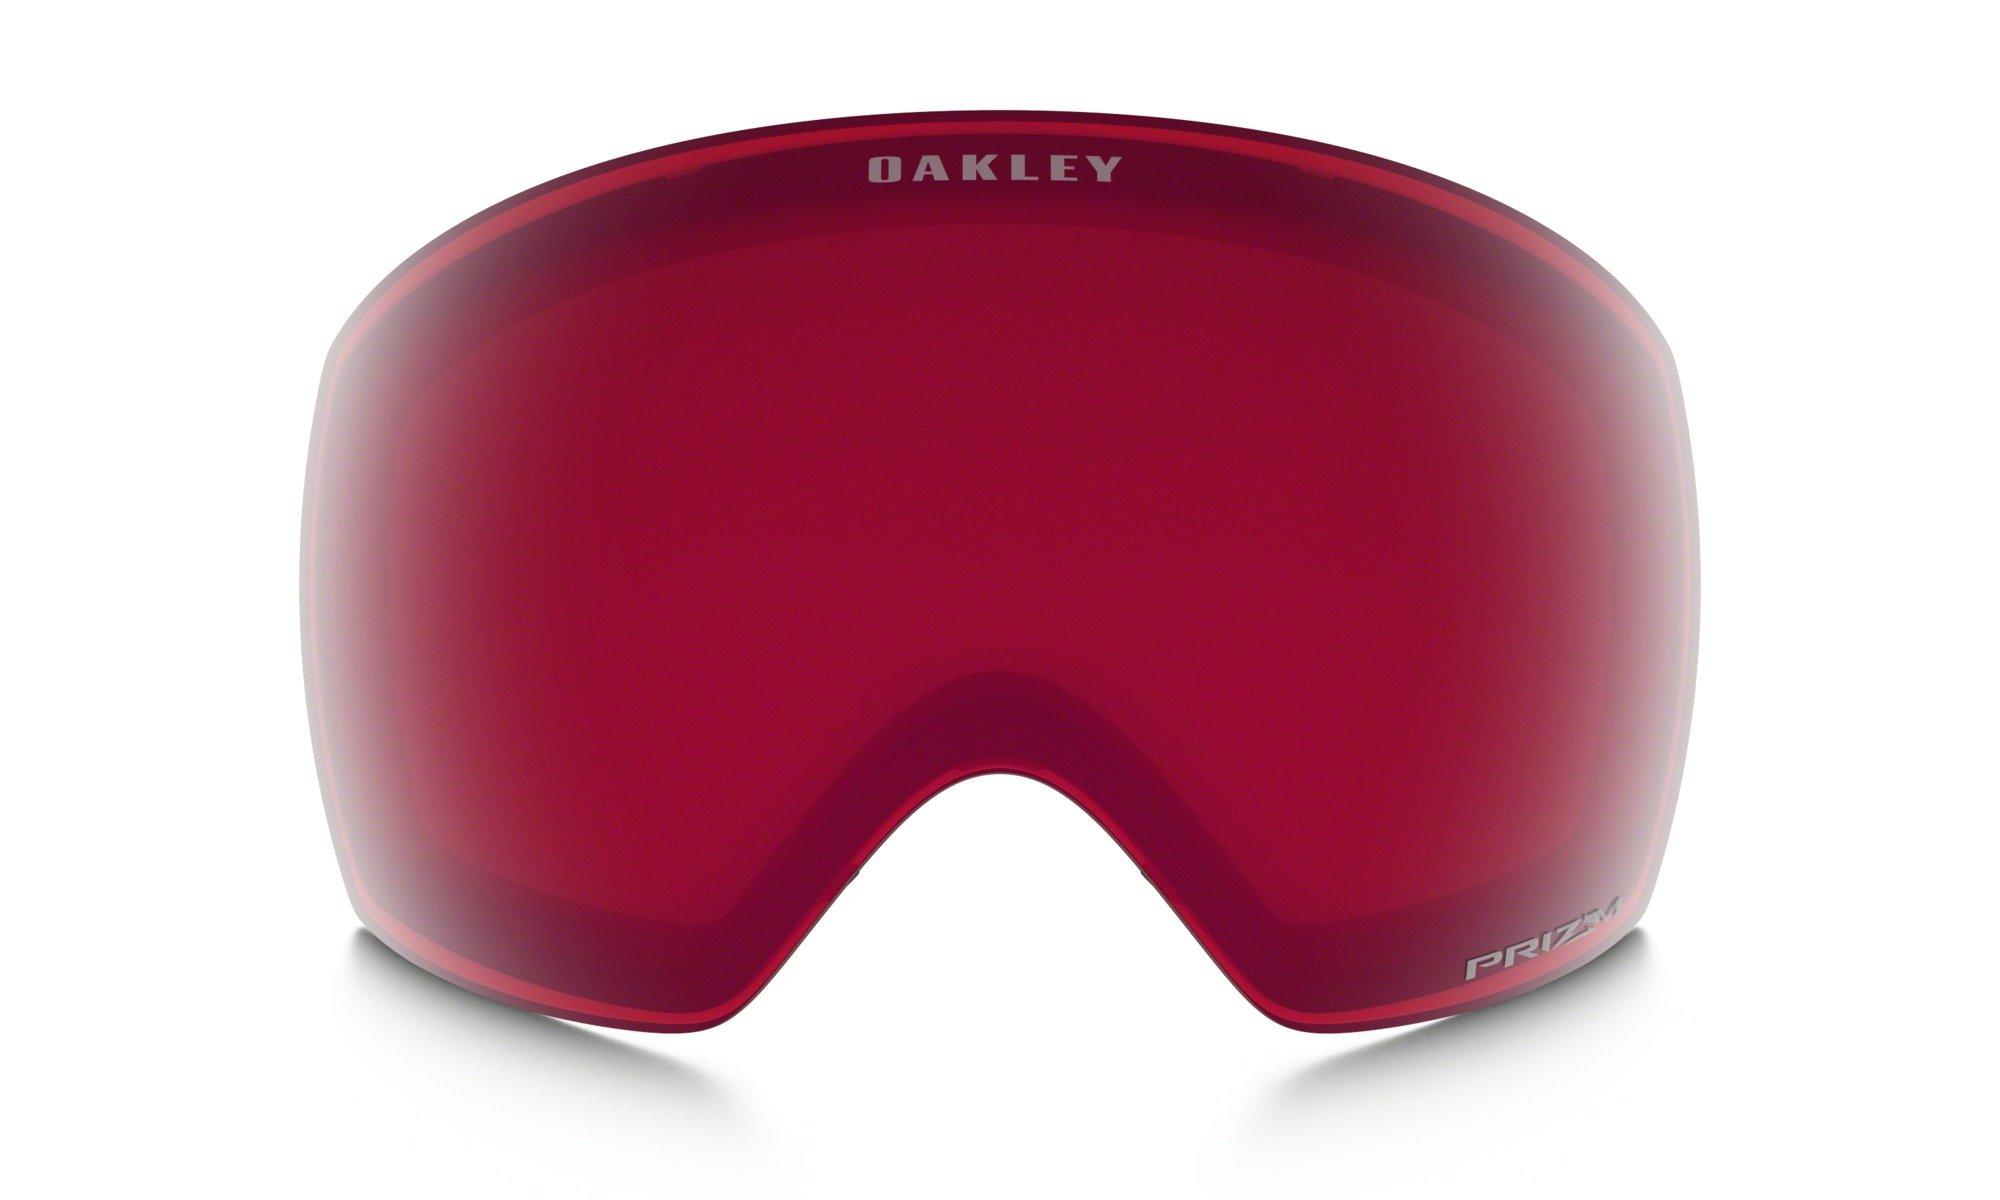 oakley snow goggle lenses qjk0  oakley snow goggle lenses